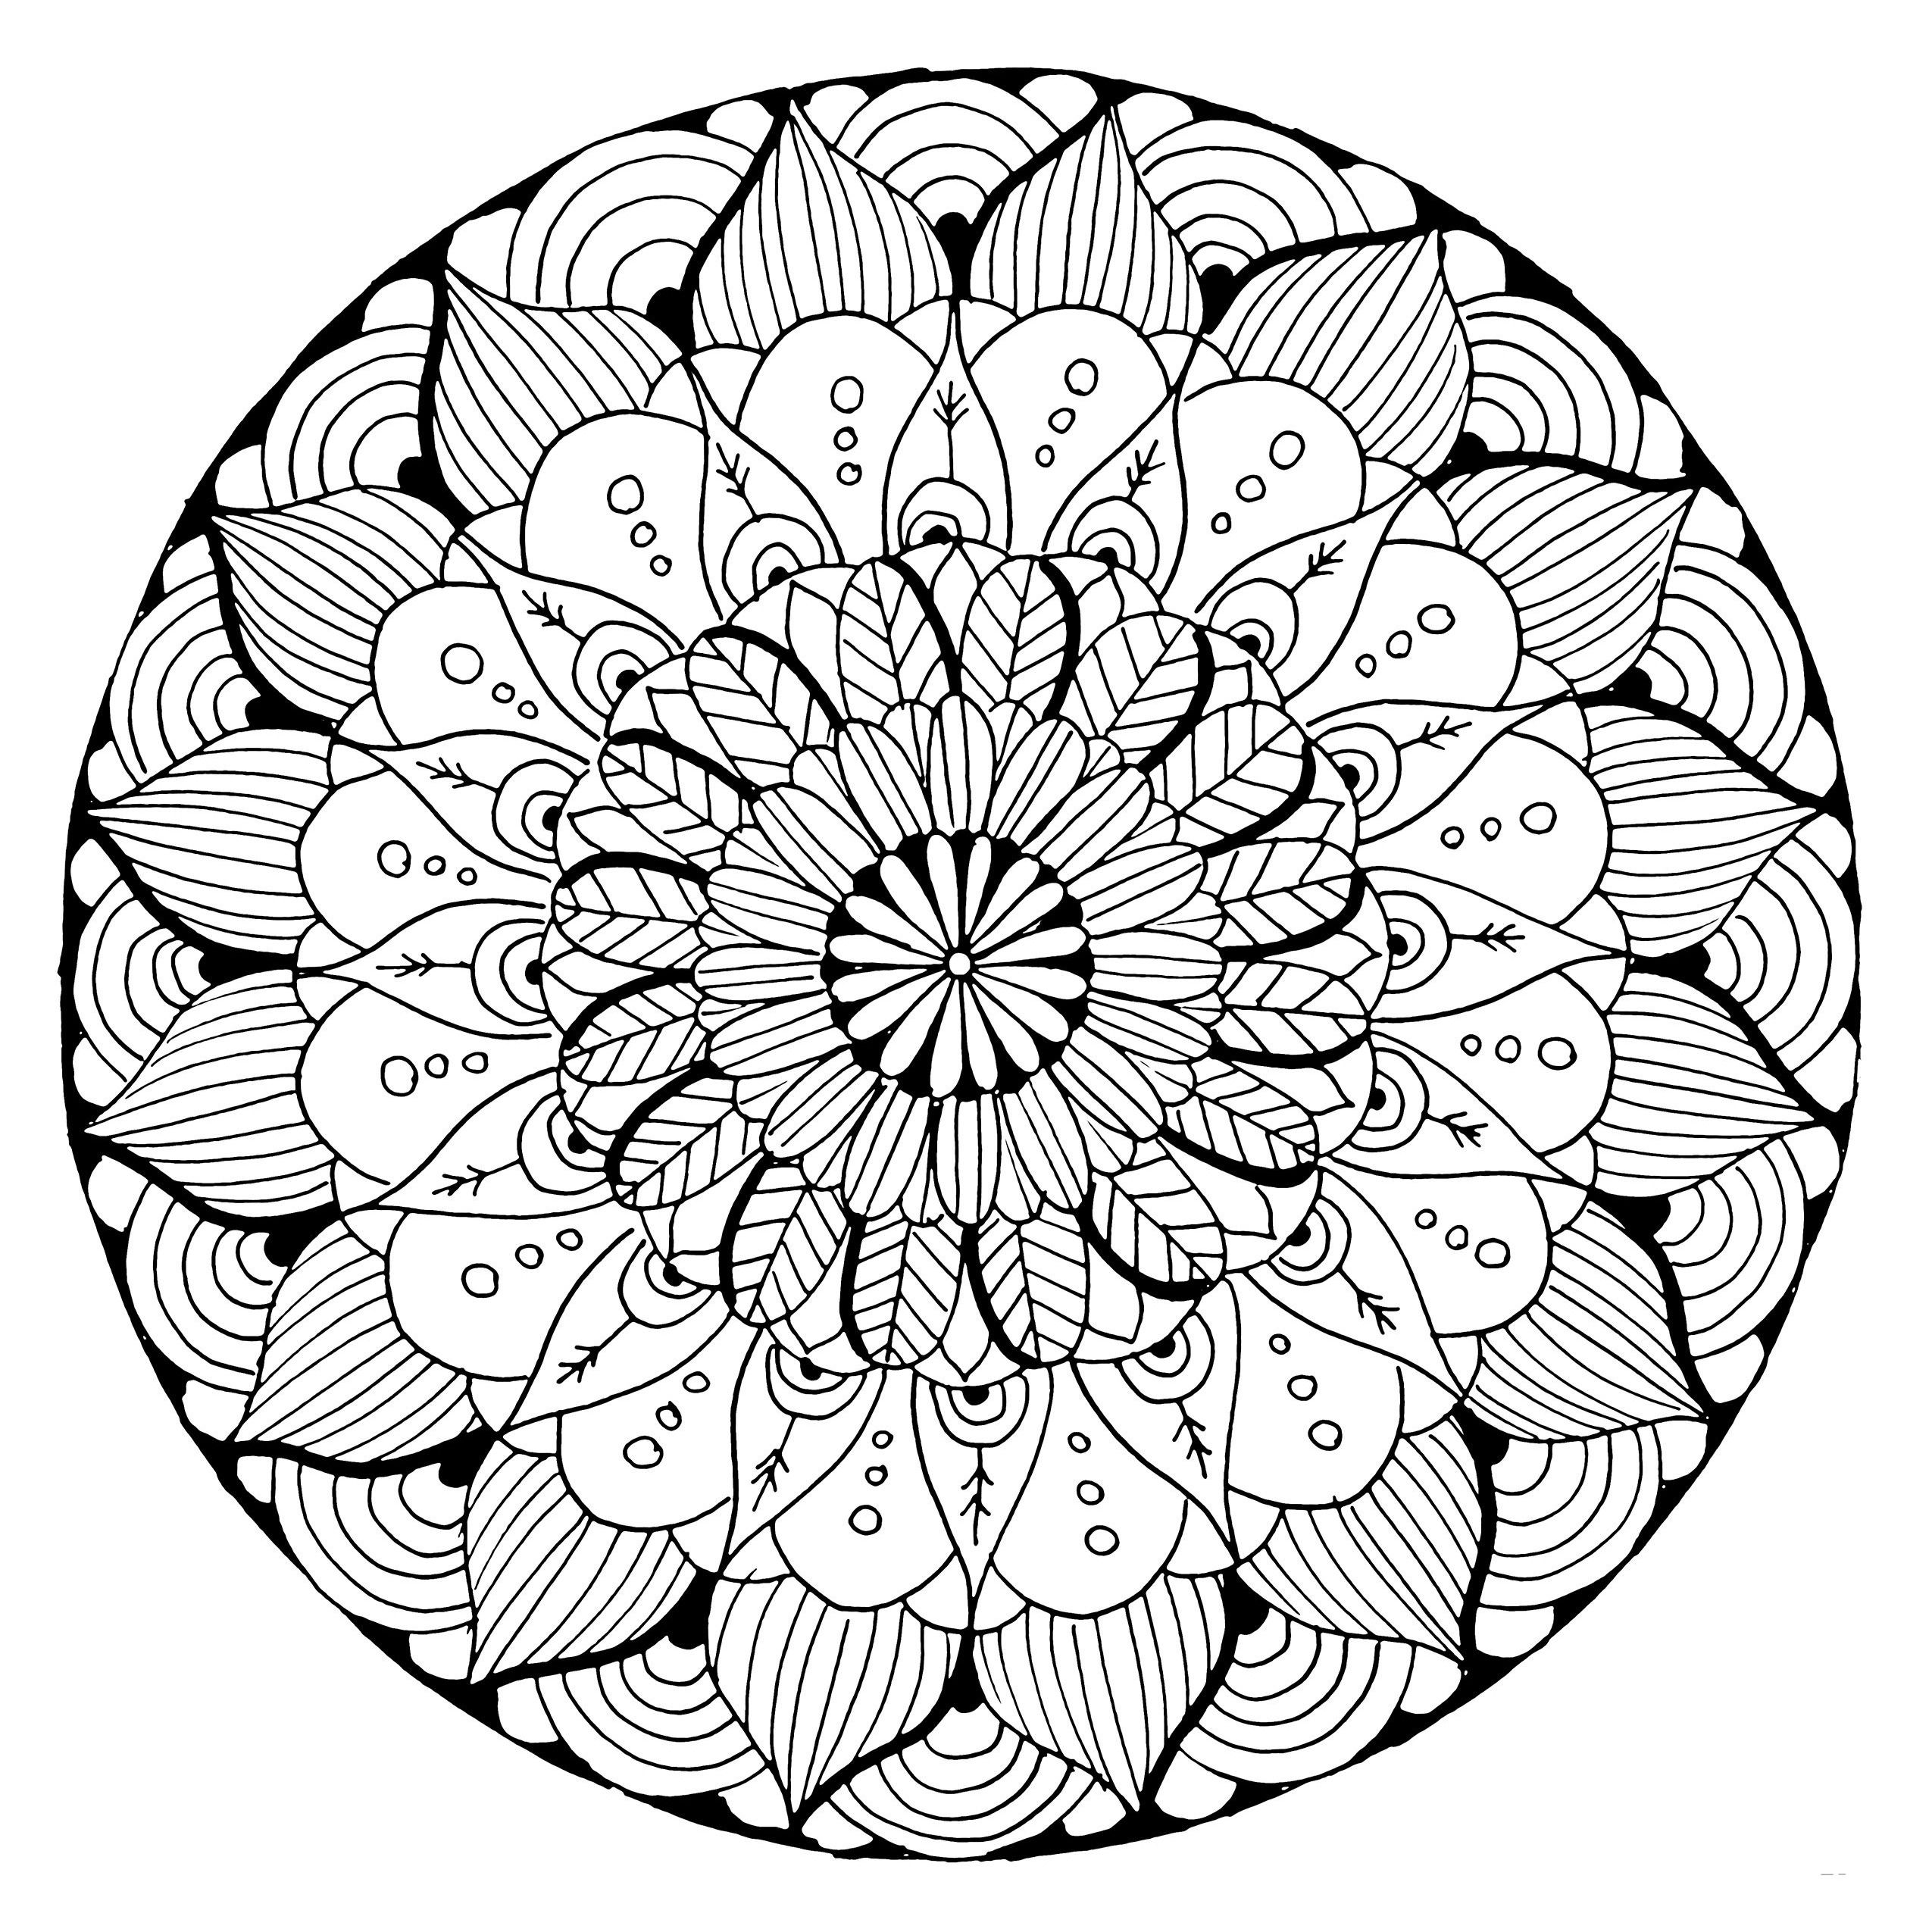 Blume - Mandalas - Malvorlagen Mandala